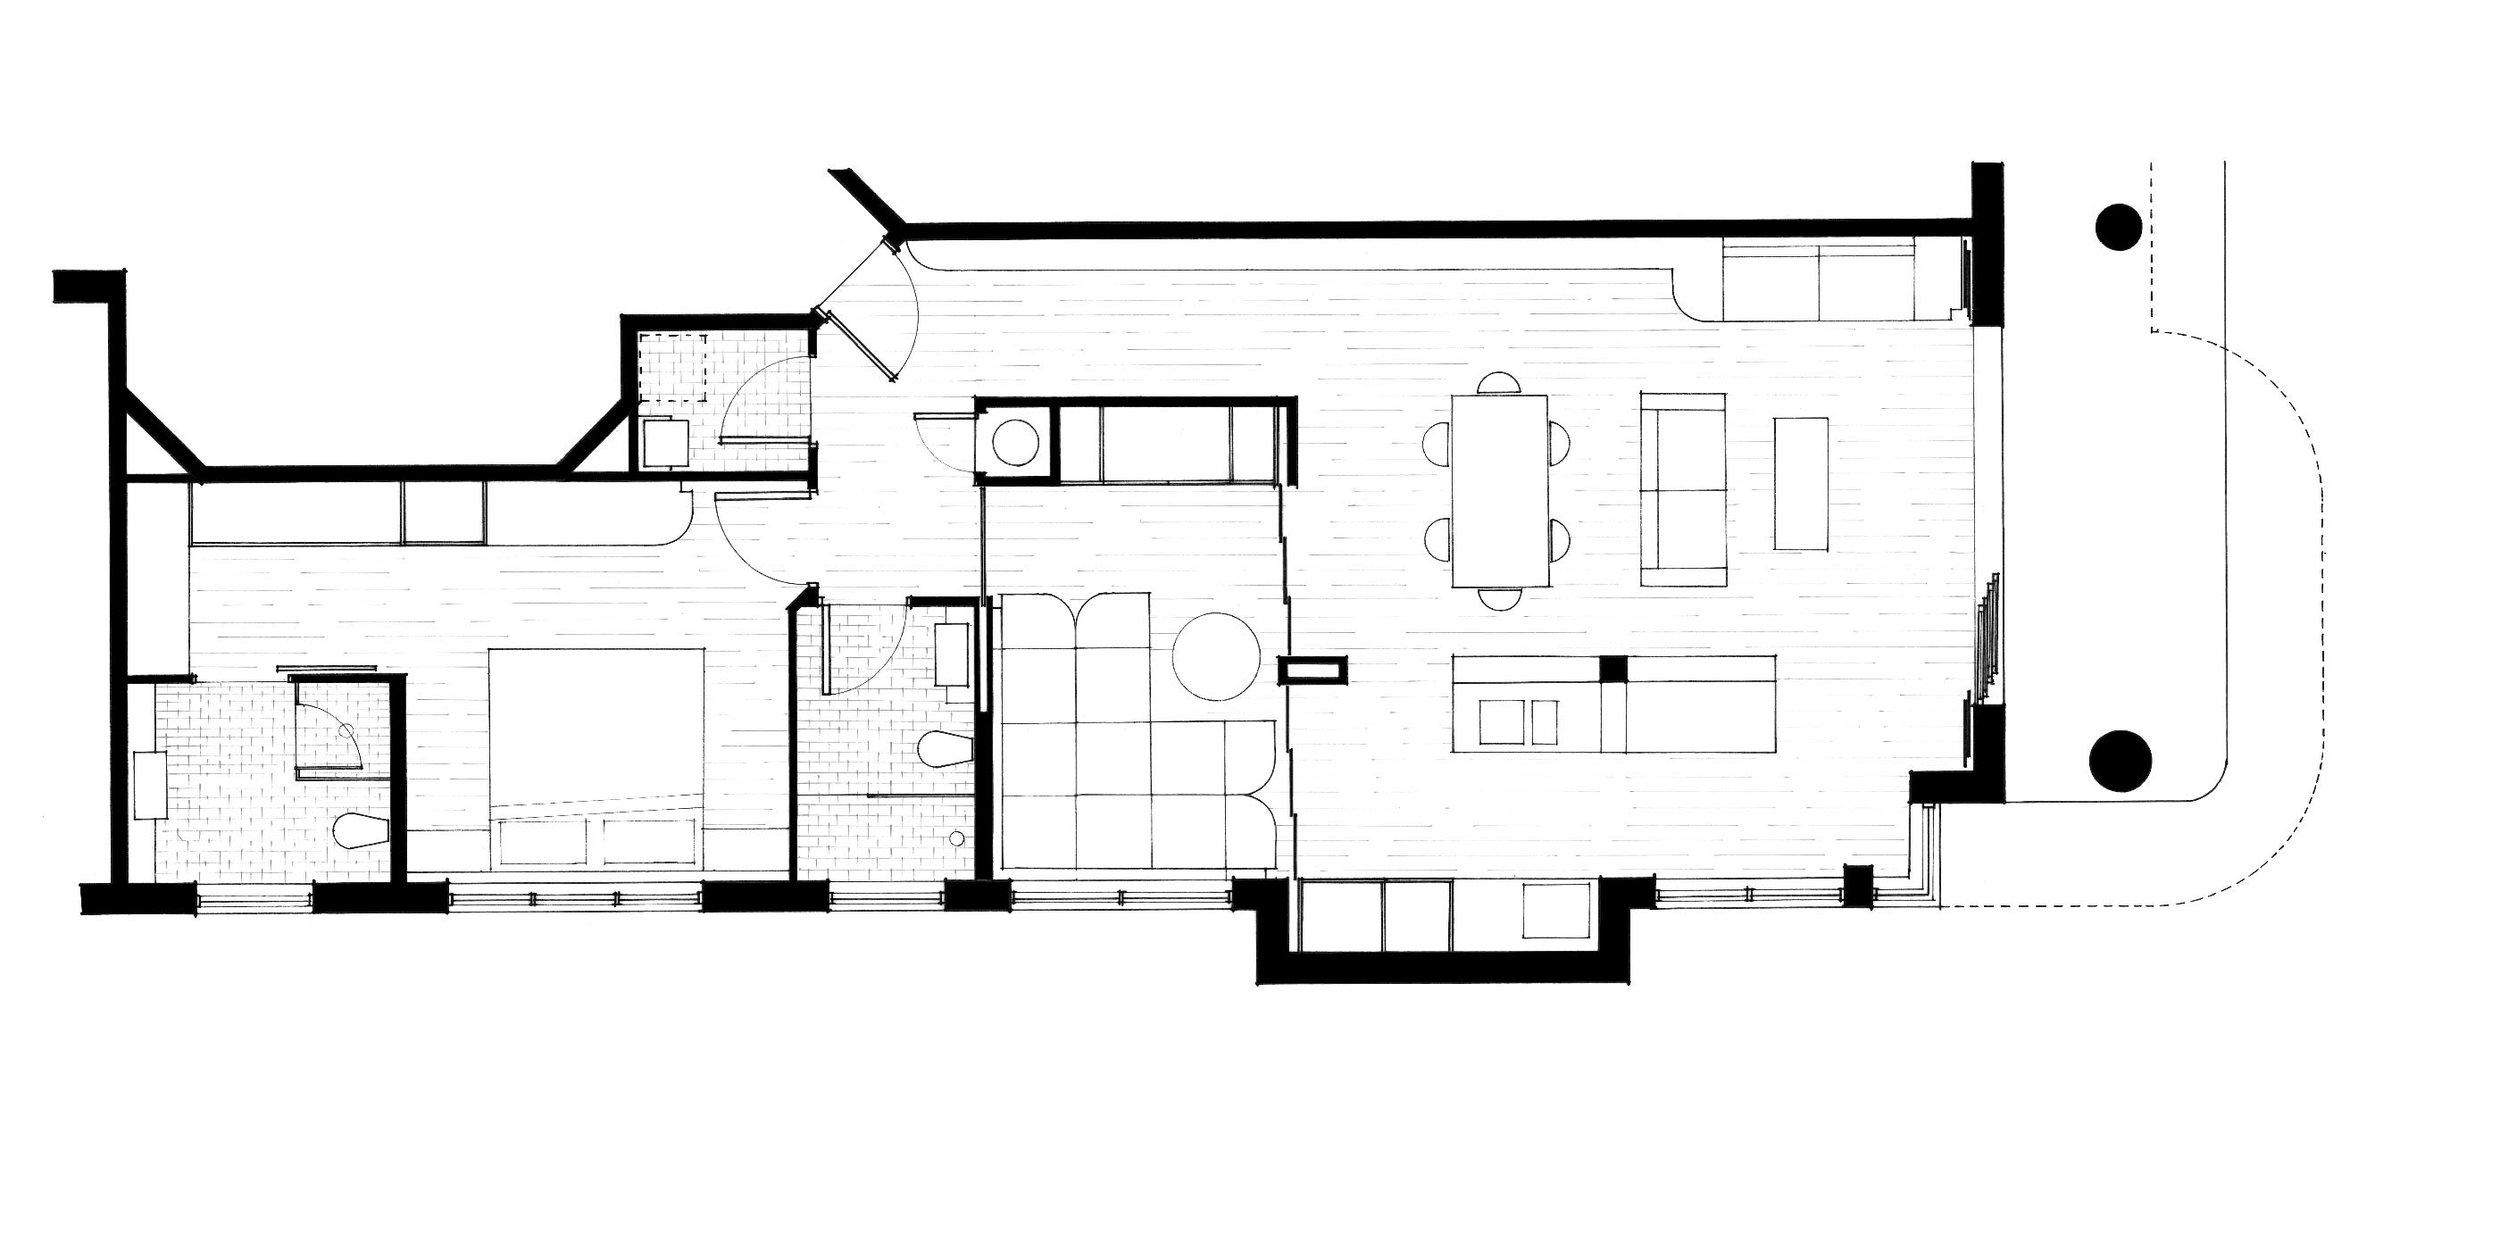 06-proposed-sketch-closed-01.jpg